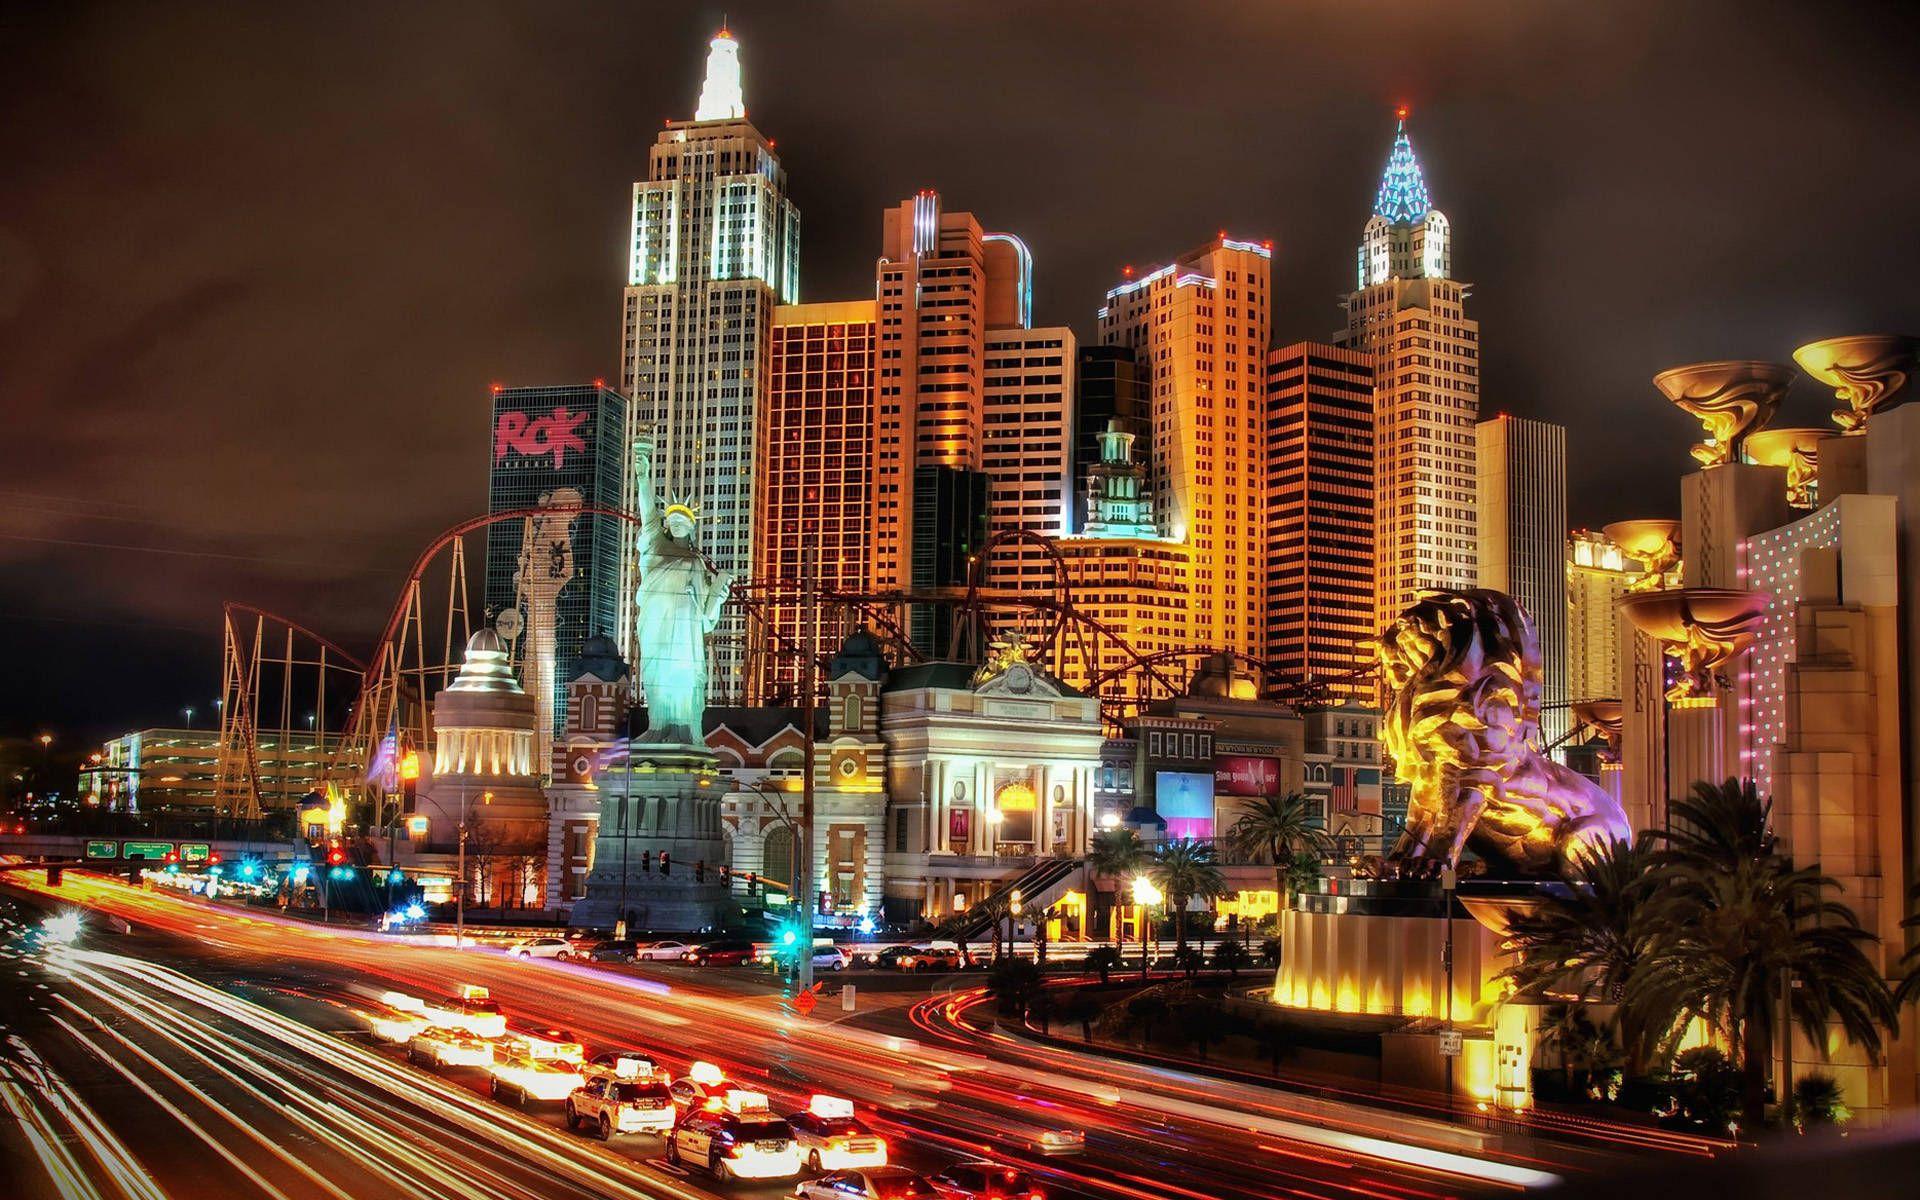 pin city nightlife wallpaper - photo #26